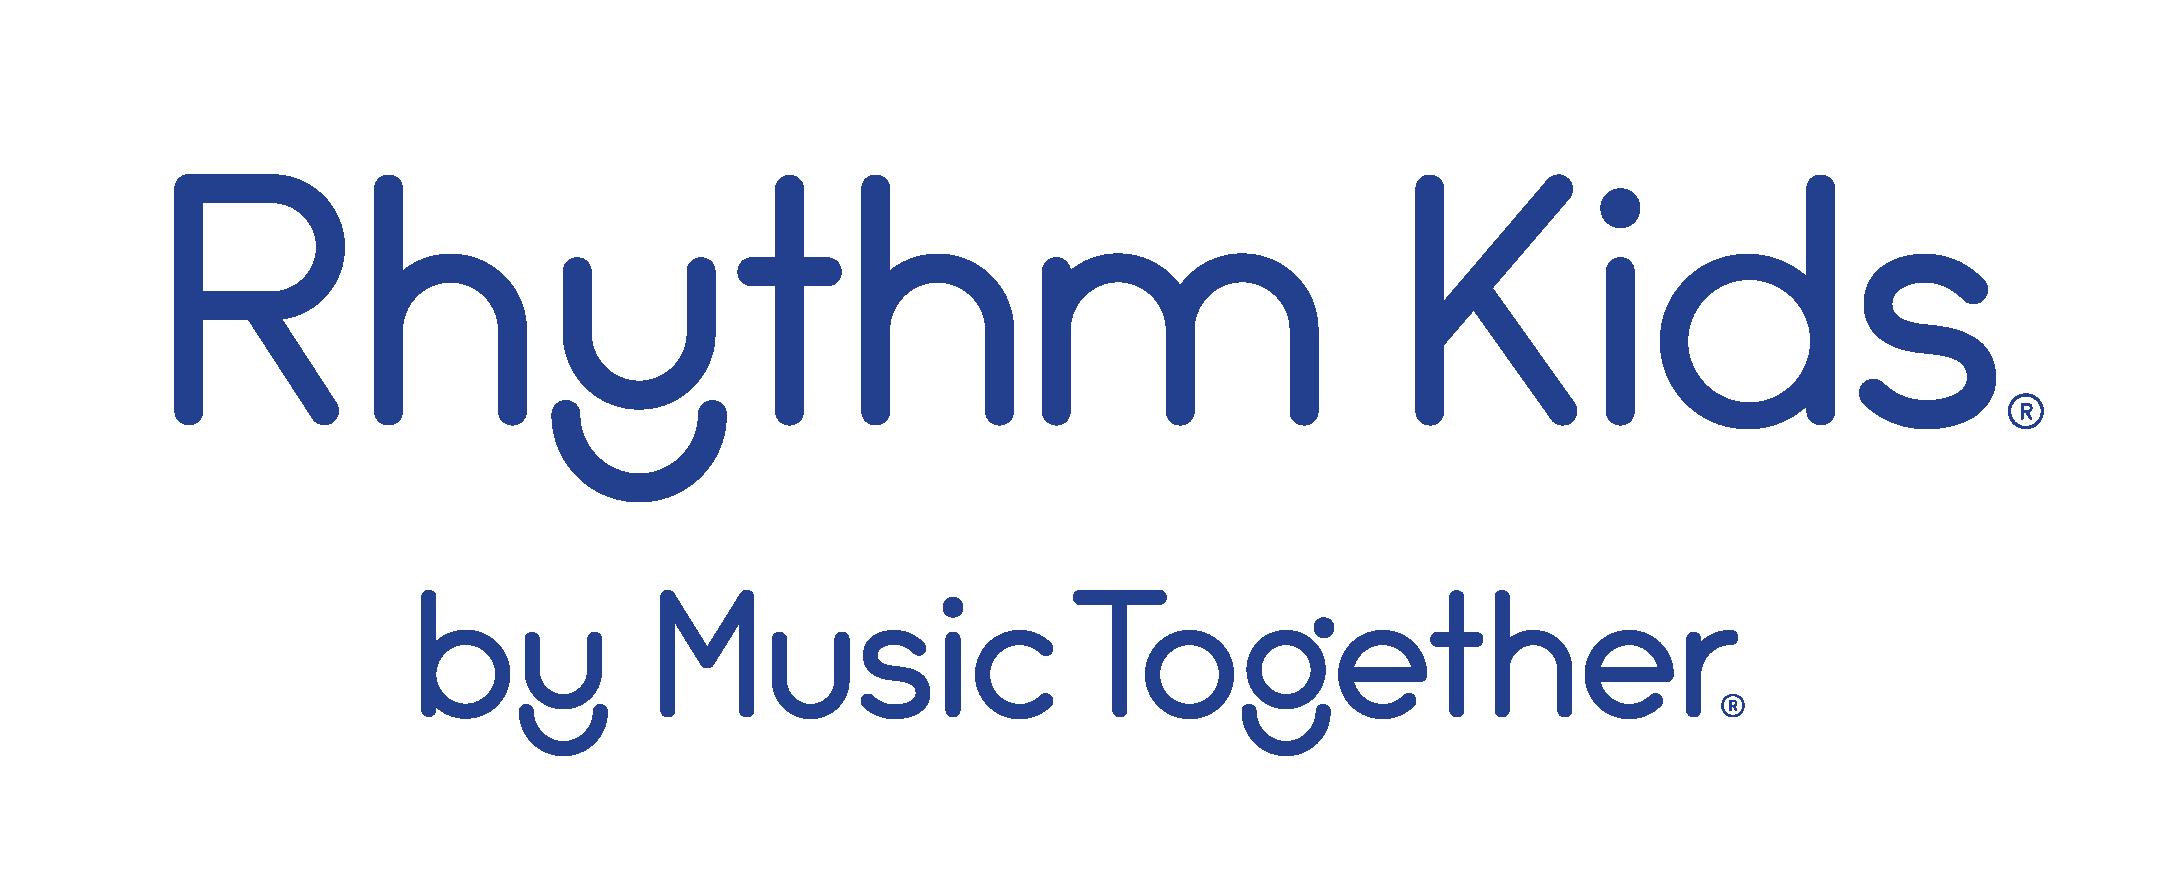 MT-ClassLogo-RhythmKids_DARKBLUE-print-L.png